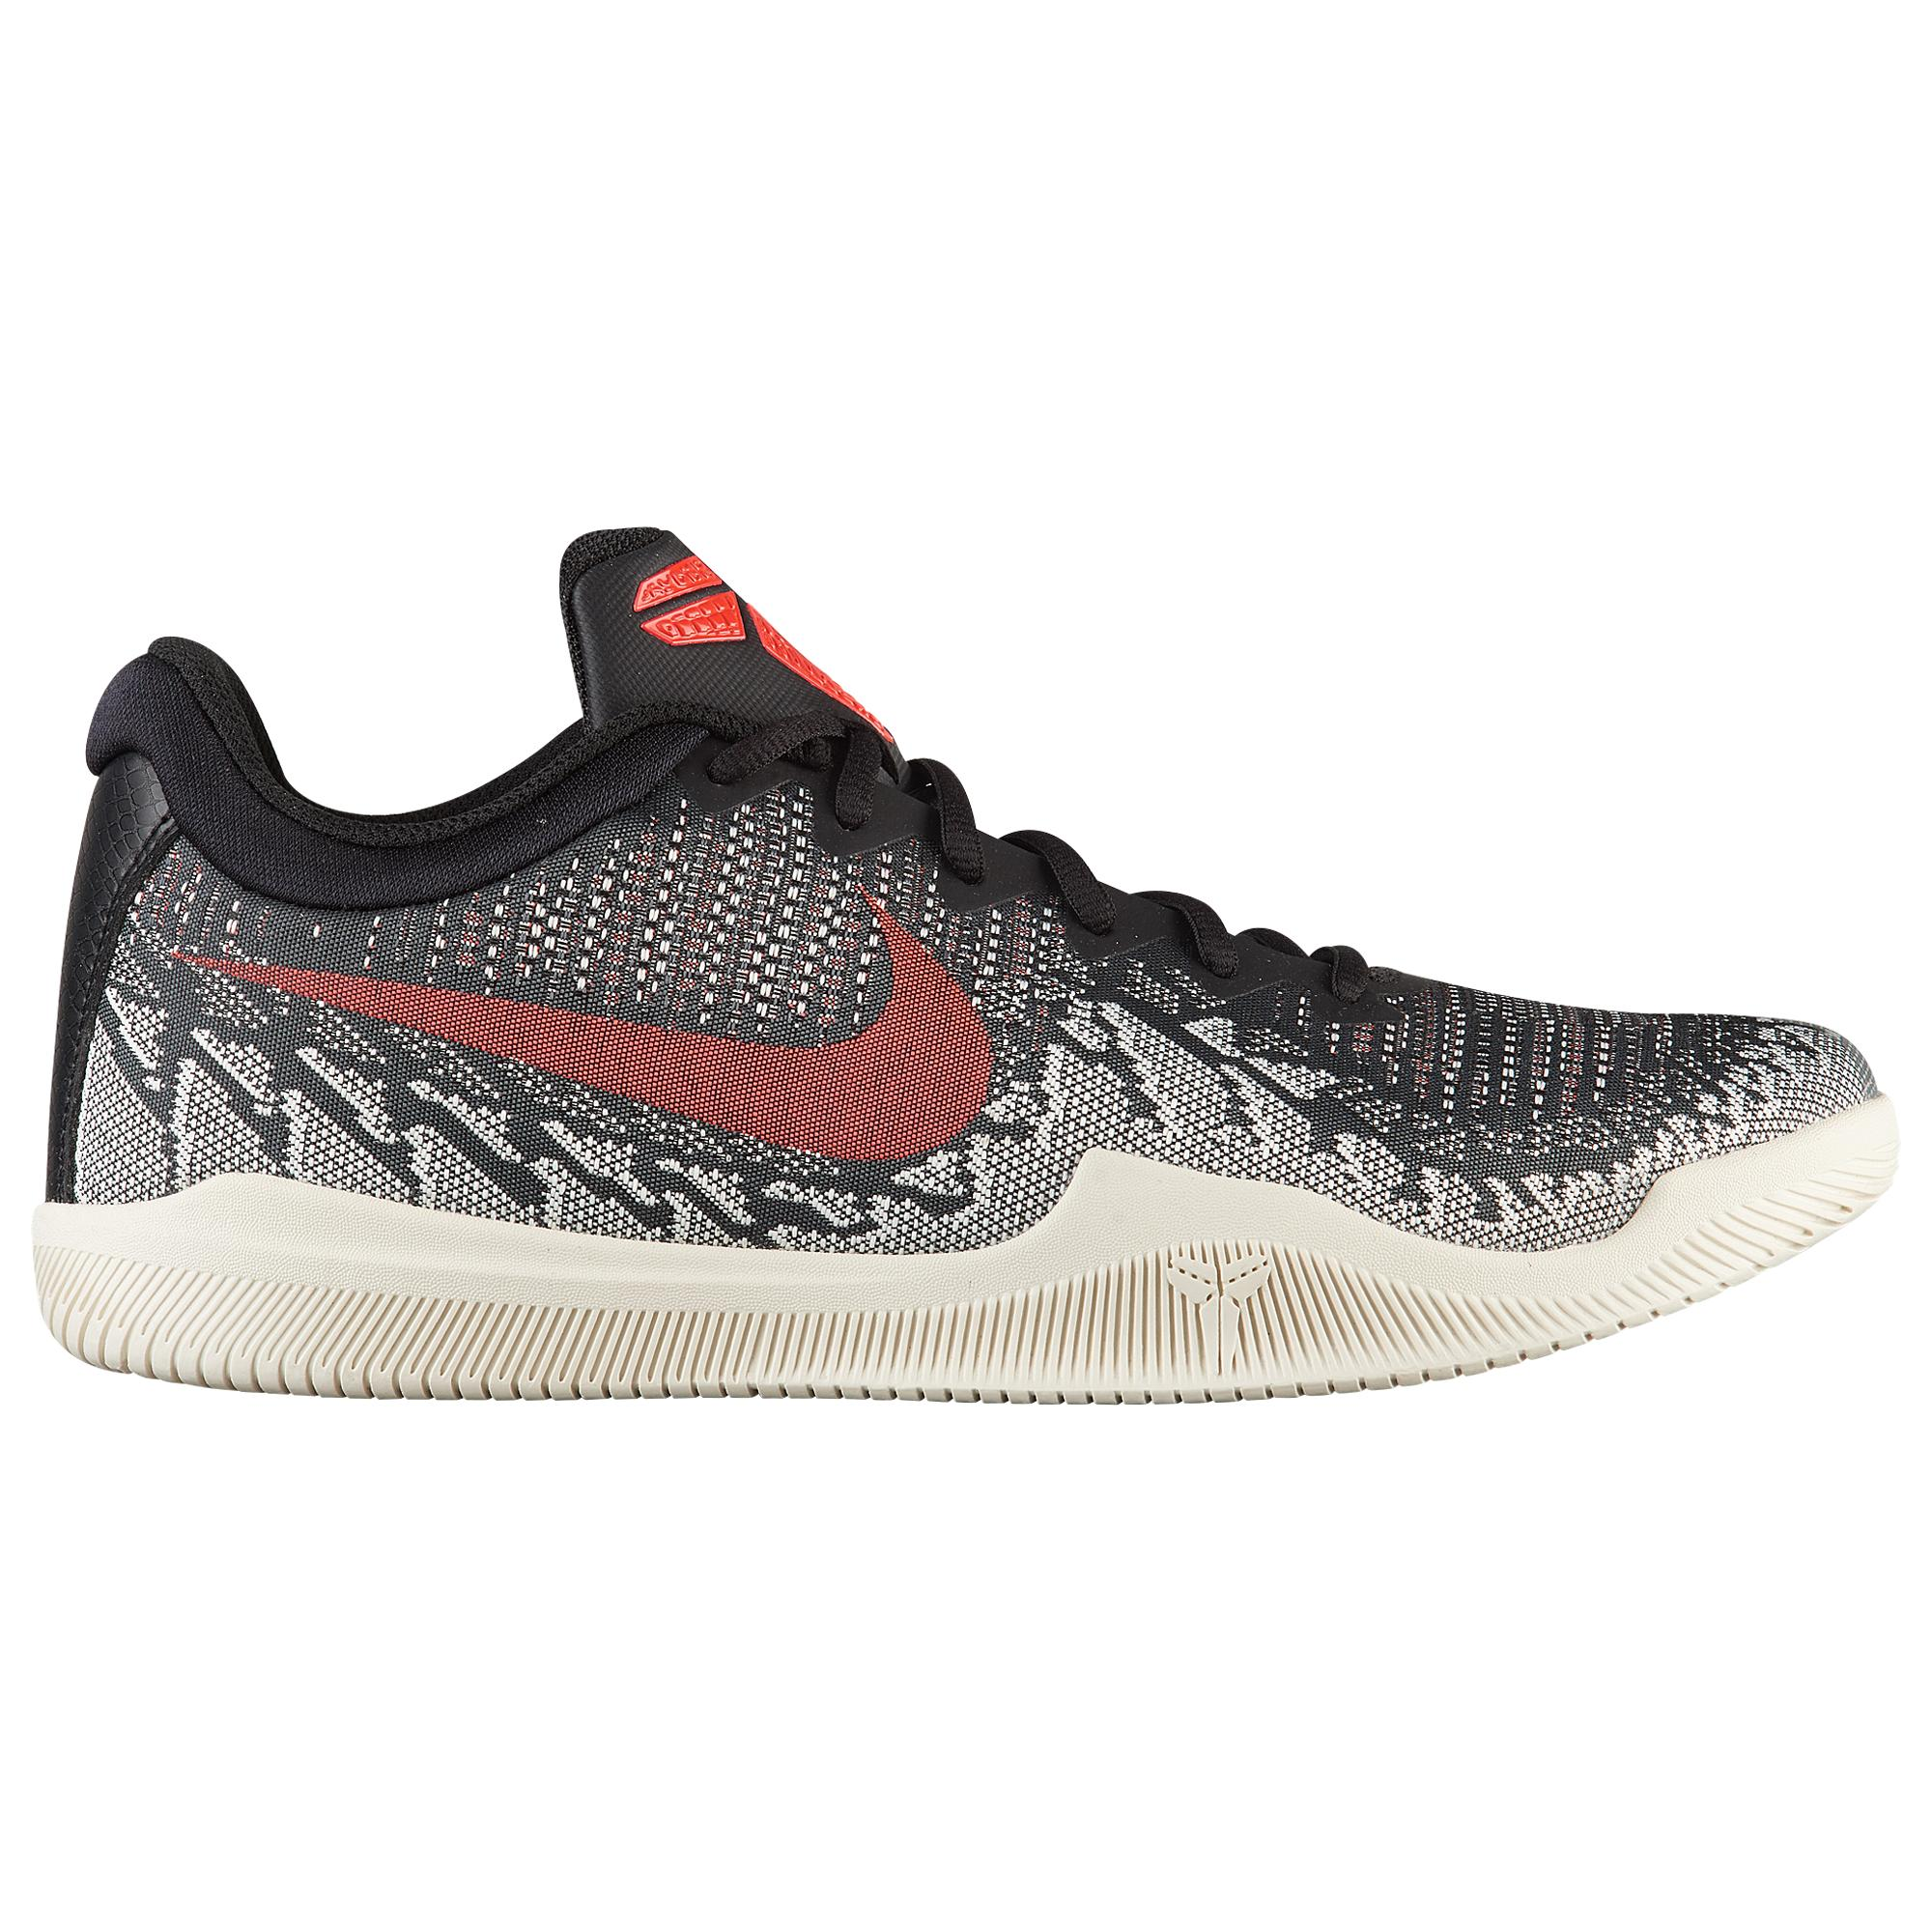 Nike Rubber Kobe Bryant Mamba Rage in Black for Men - Lyst